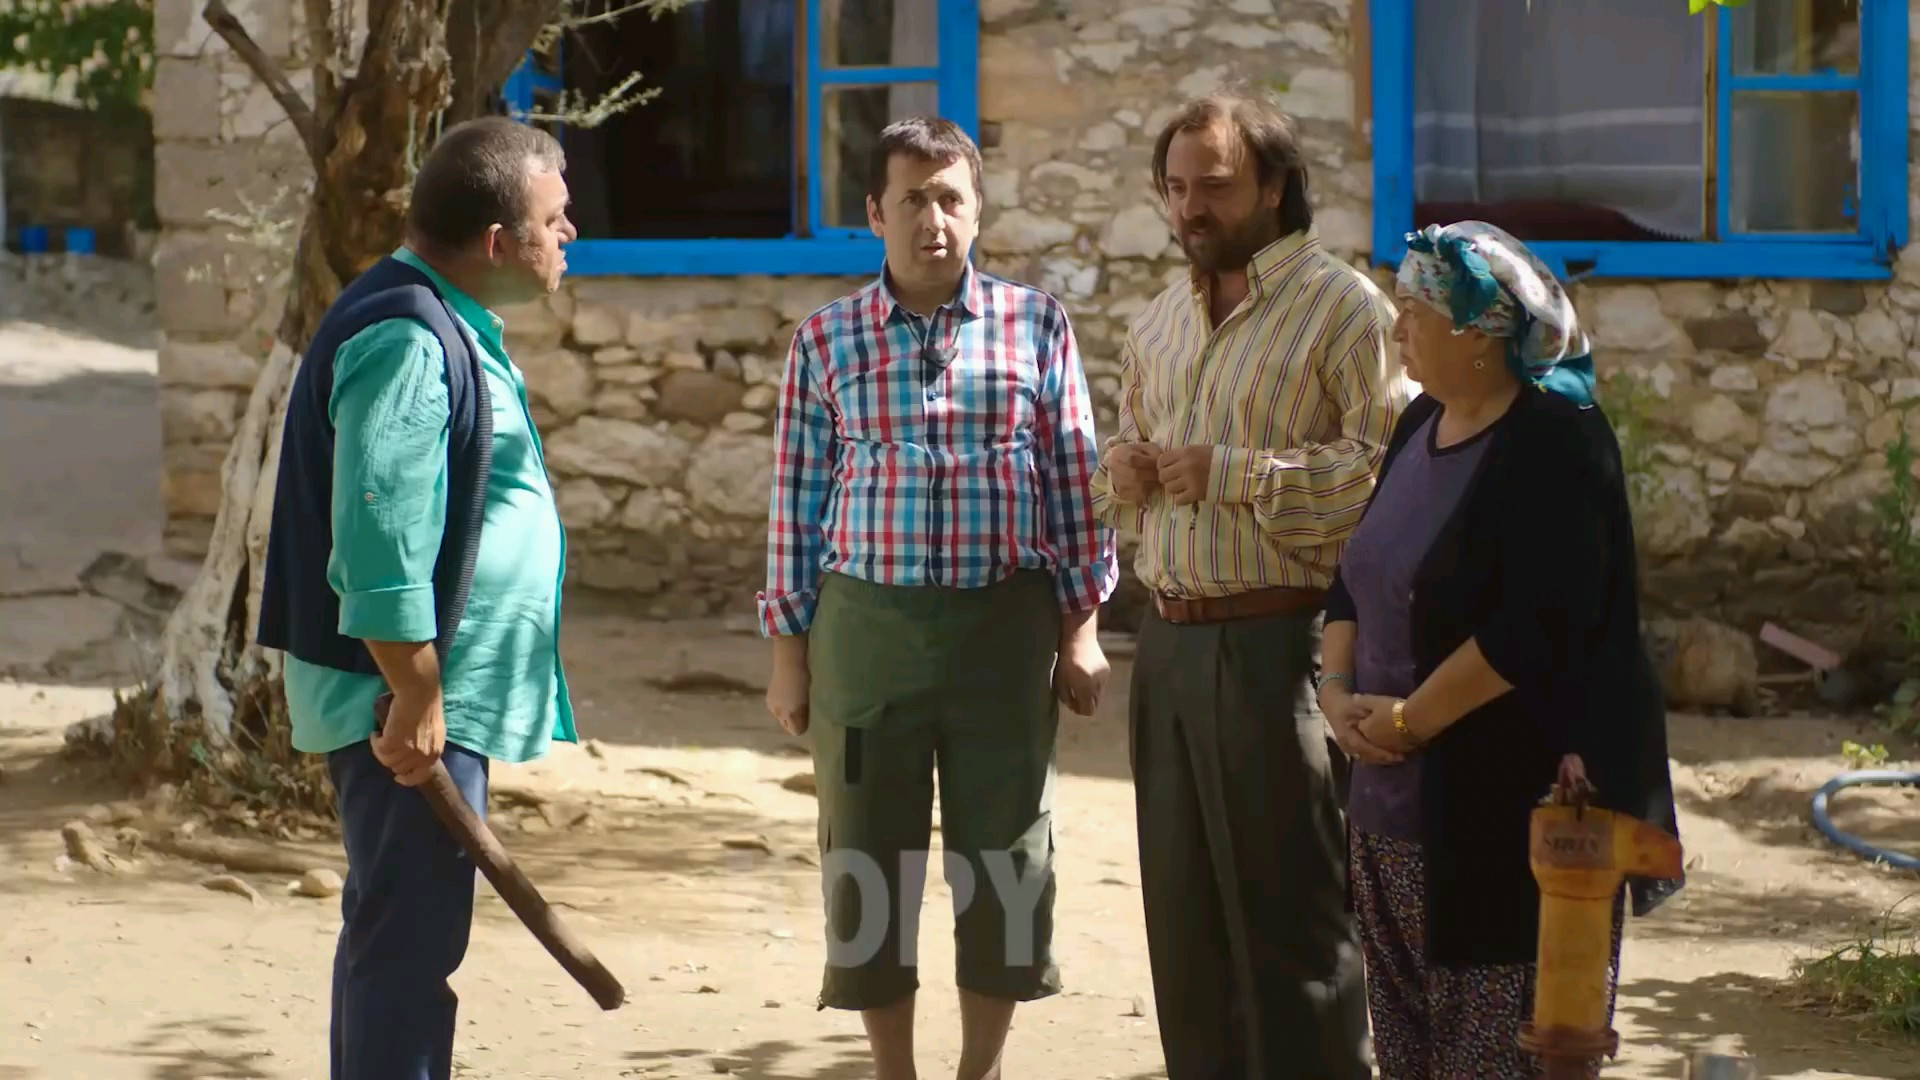 Bahtiyar Bahtıkara | 2017 | Yerli Film | WEB-DL | XviD | Sansürsüz | m720p - m1080p | WEB-DL | Tek Link